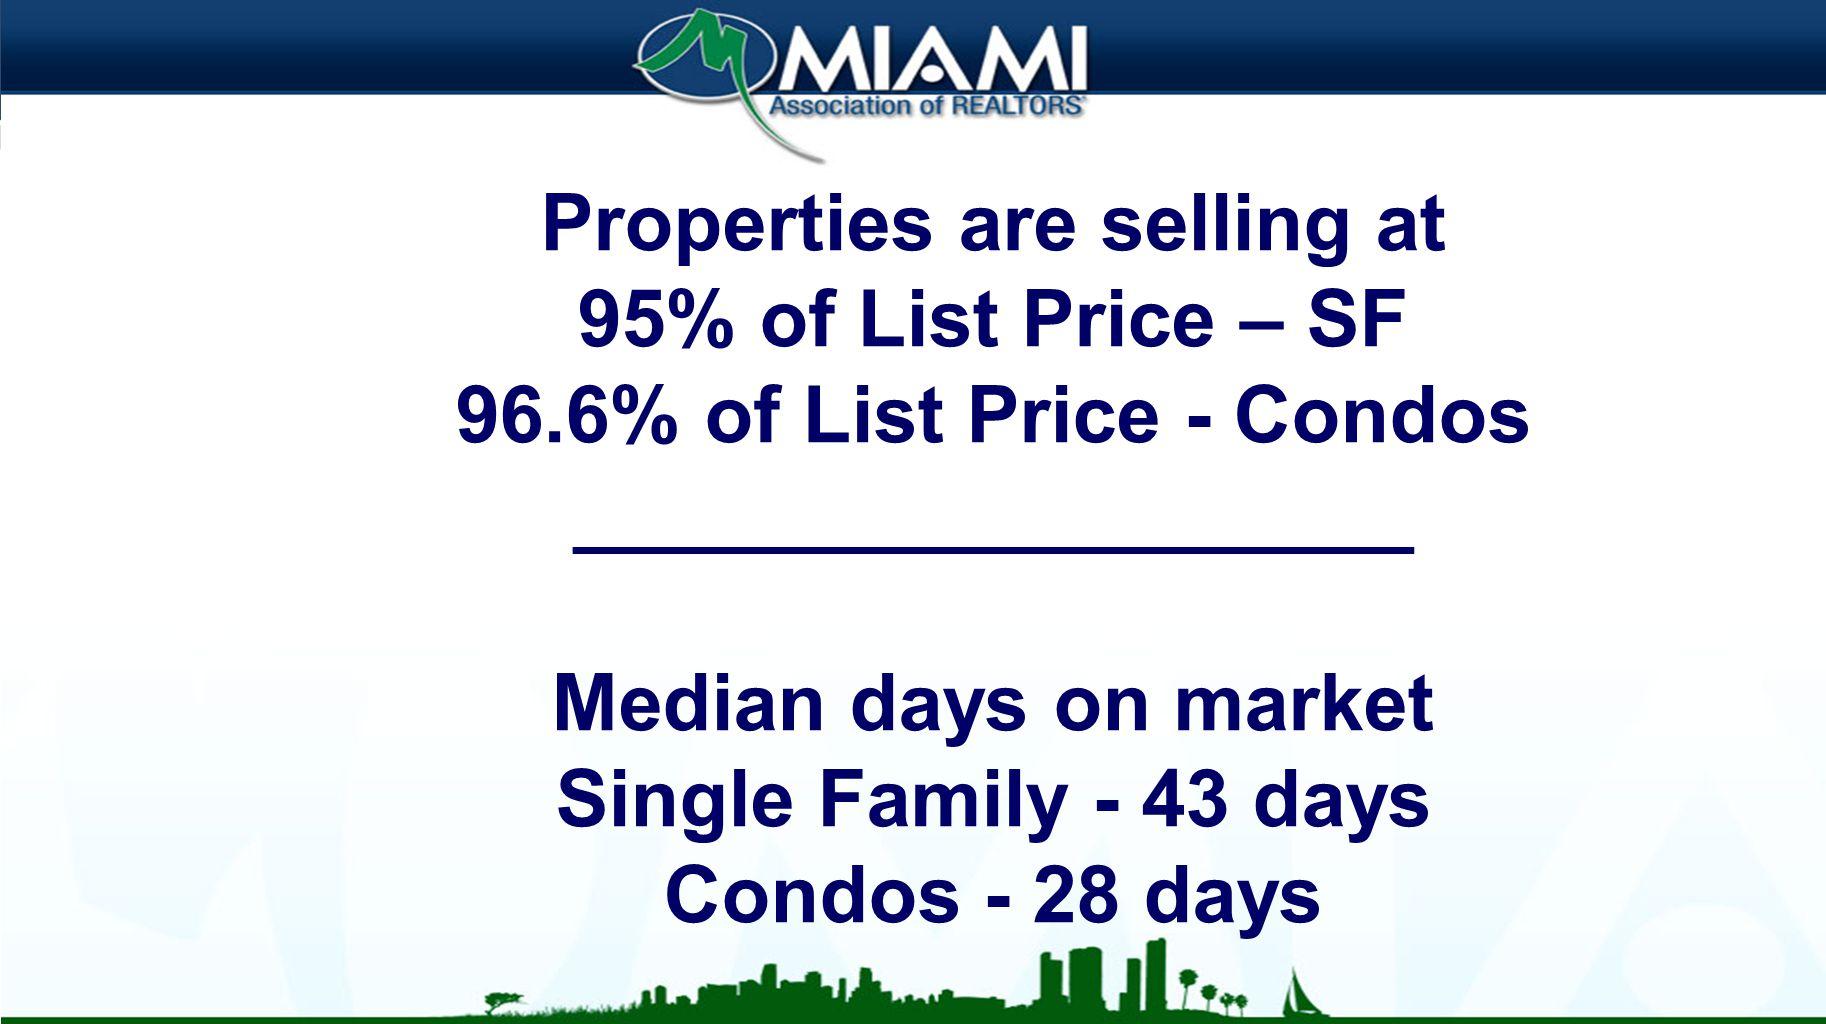 Cash Sales National 33% Cash Sales Miami 60% Cash Sales 42% Single Family 74% Condos _____________ New Construction apx 90%